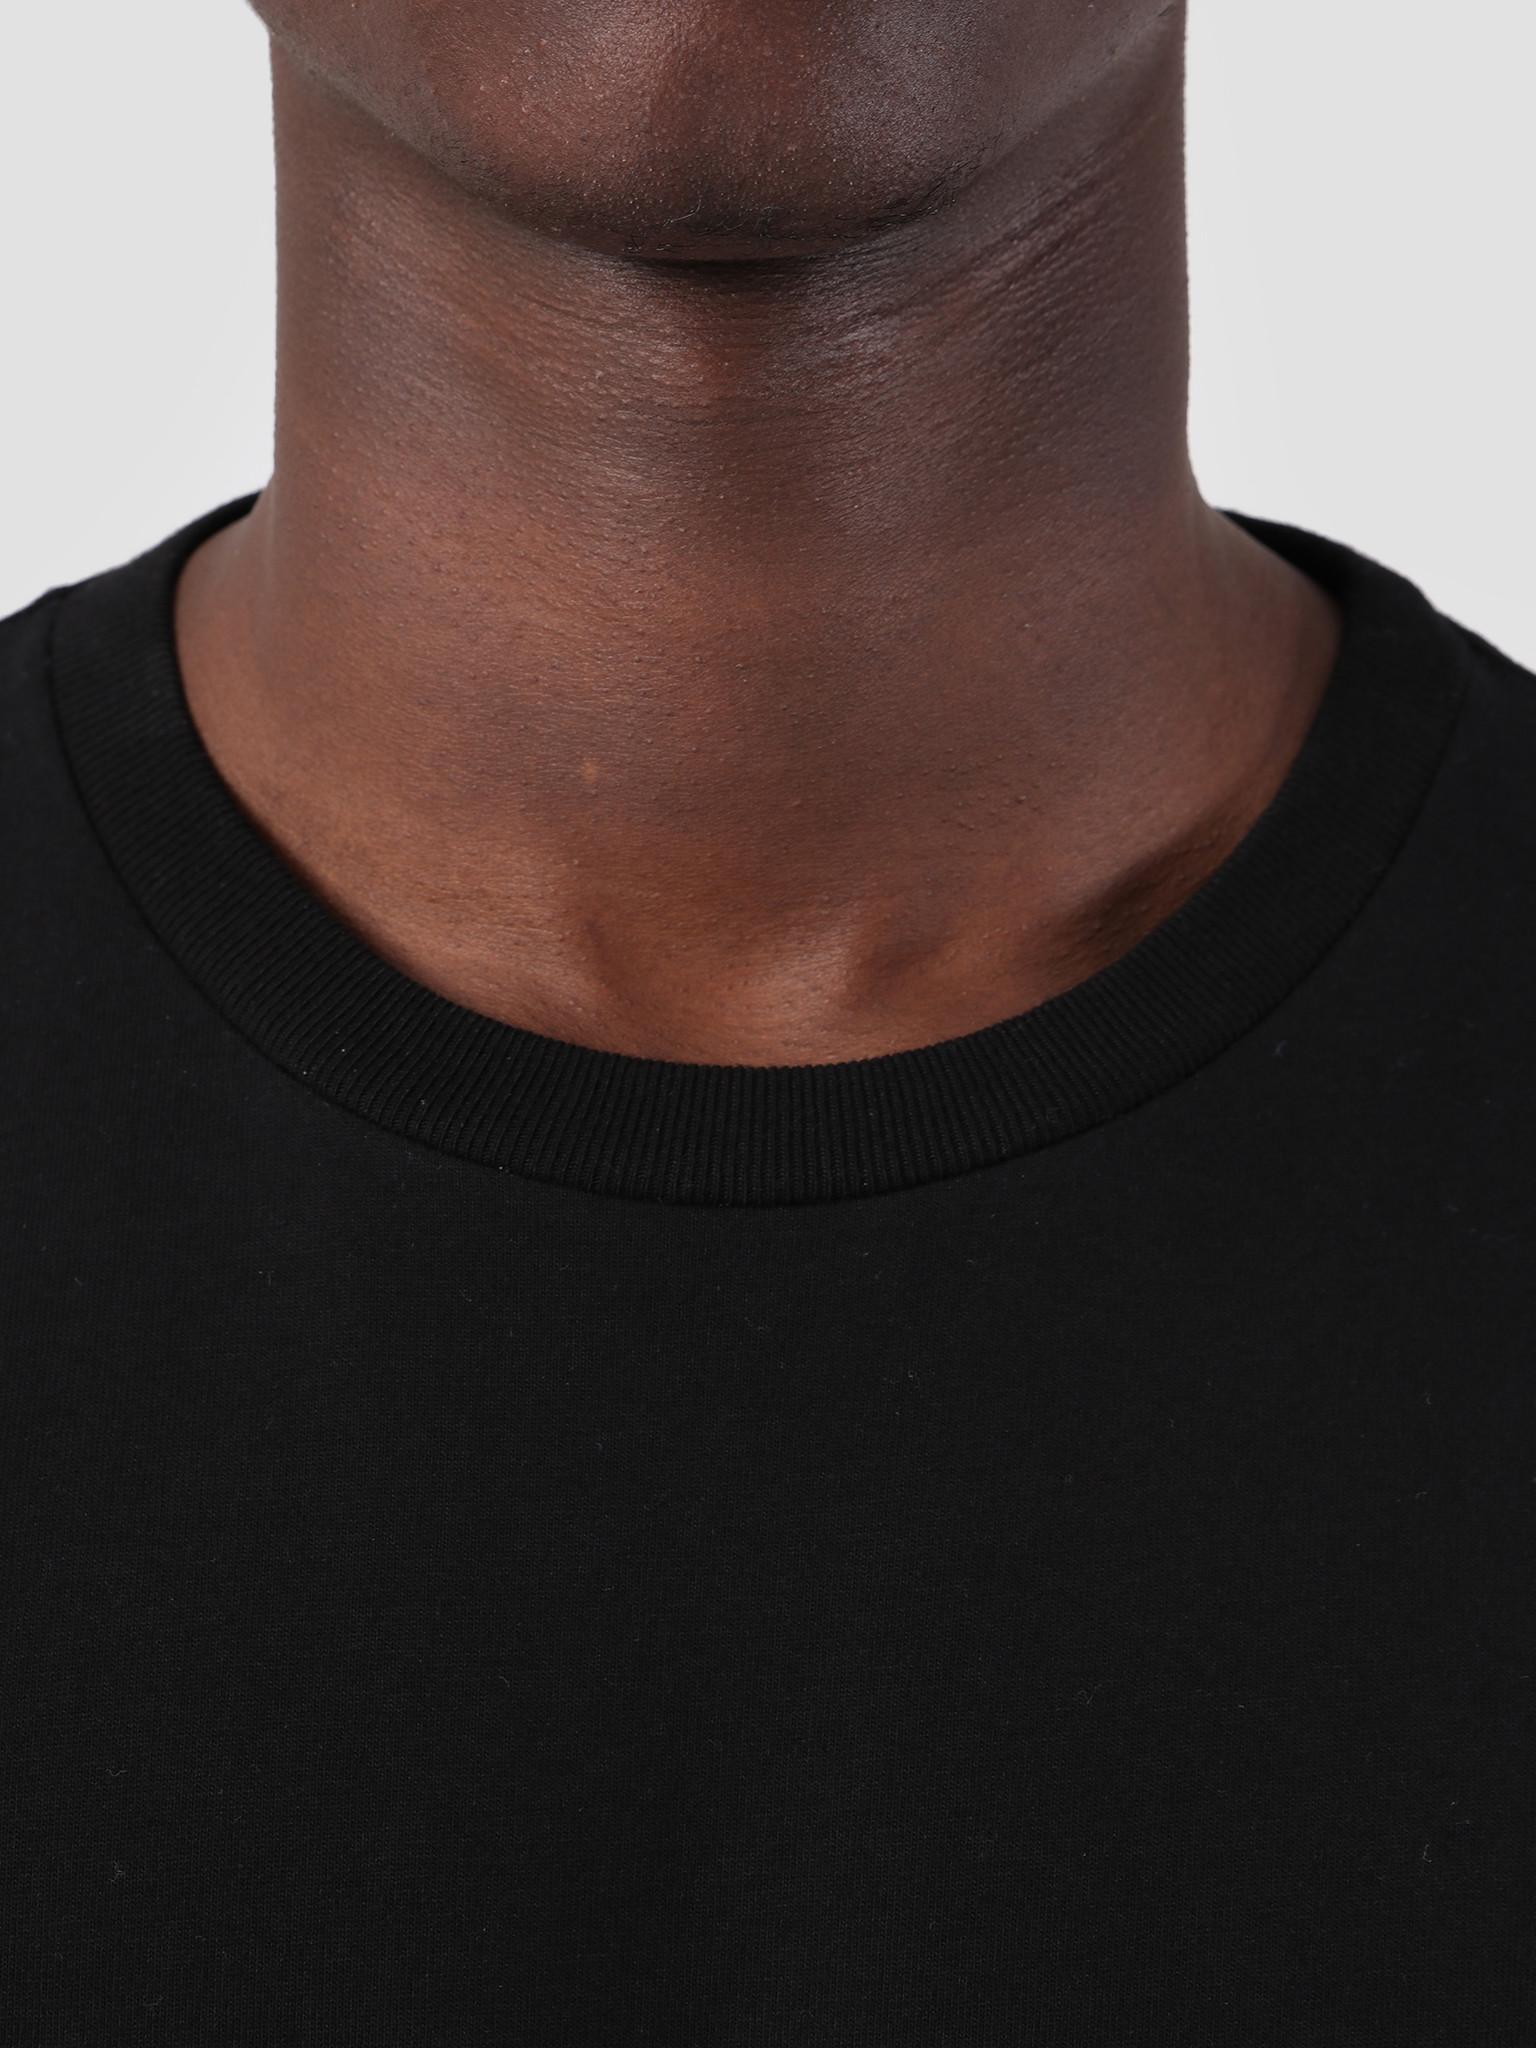 Carhartt WIP Carhartt WIP x FRESHCOTTON Dr. Rat Longsleeve Black Gold I028084